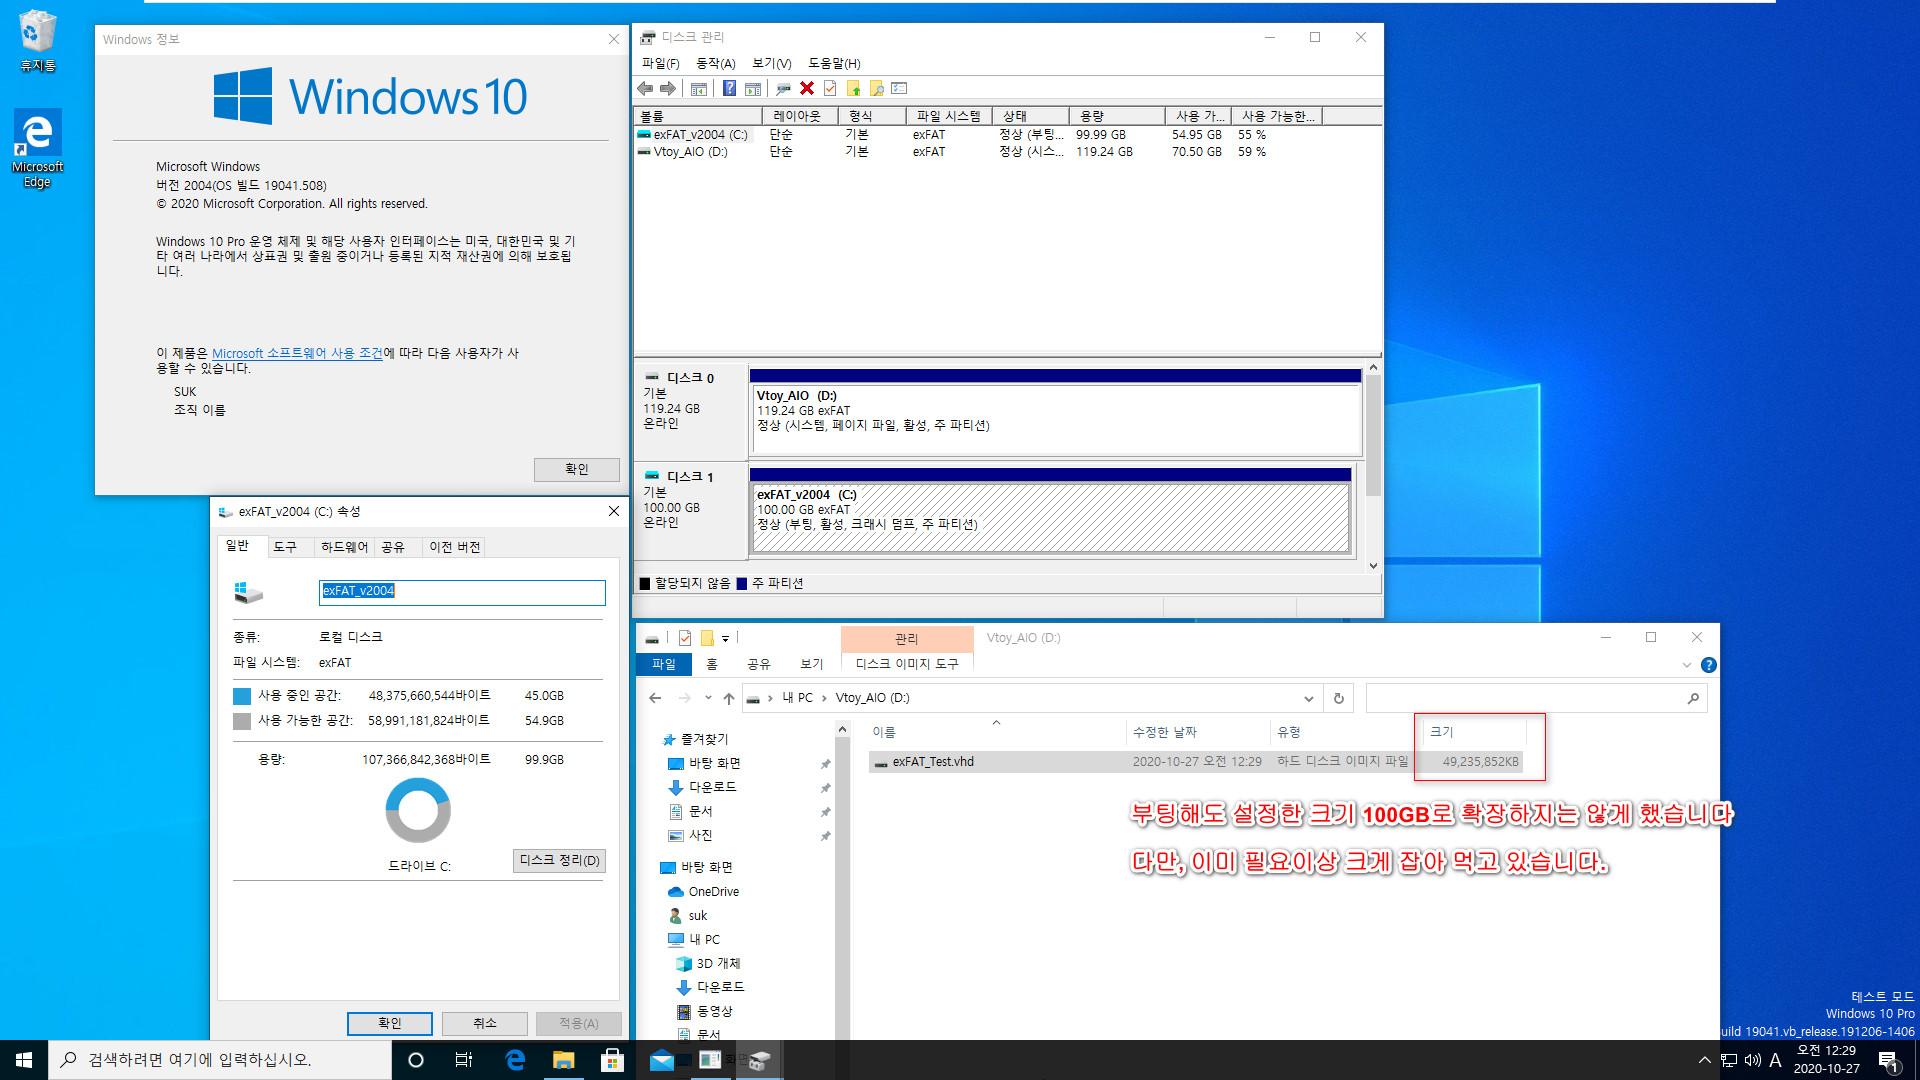 exFAT 포맷으로도 VHD 부팅이 Windows 10 버전 1903부터 된다고 하여 테스트 - 생고생만 하다가 컴퓨터 먹통 2번이나 되고 그만뒀습니다 2020-10-27_002953.jpg